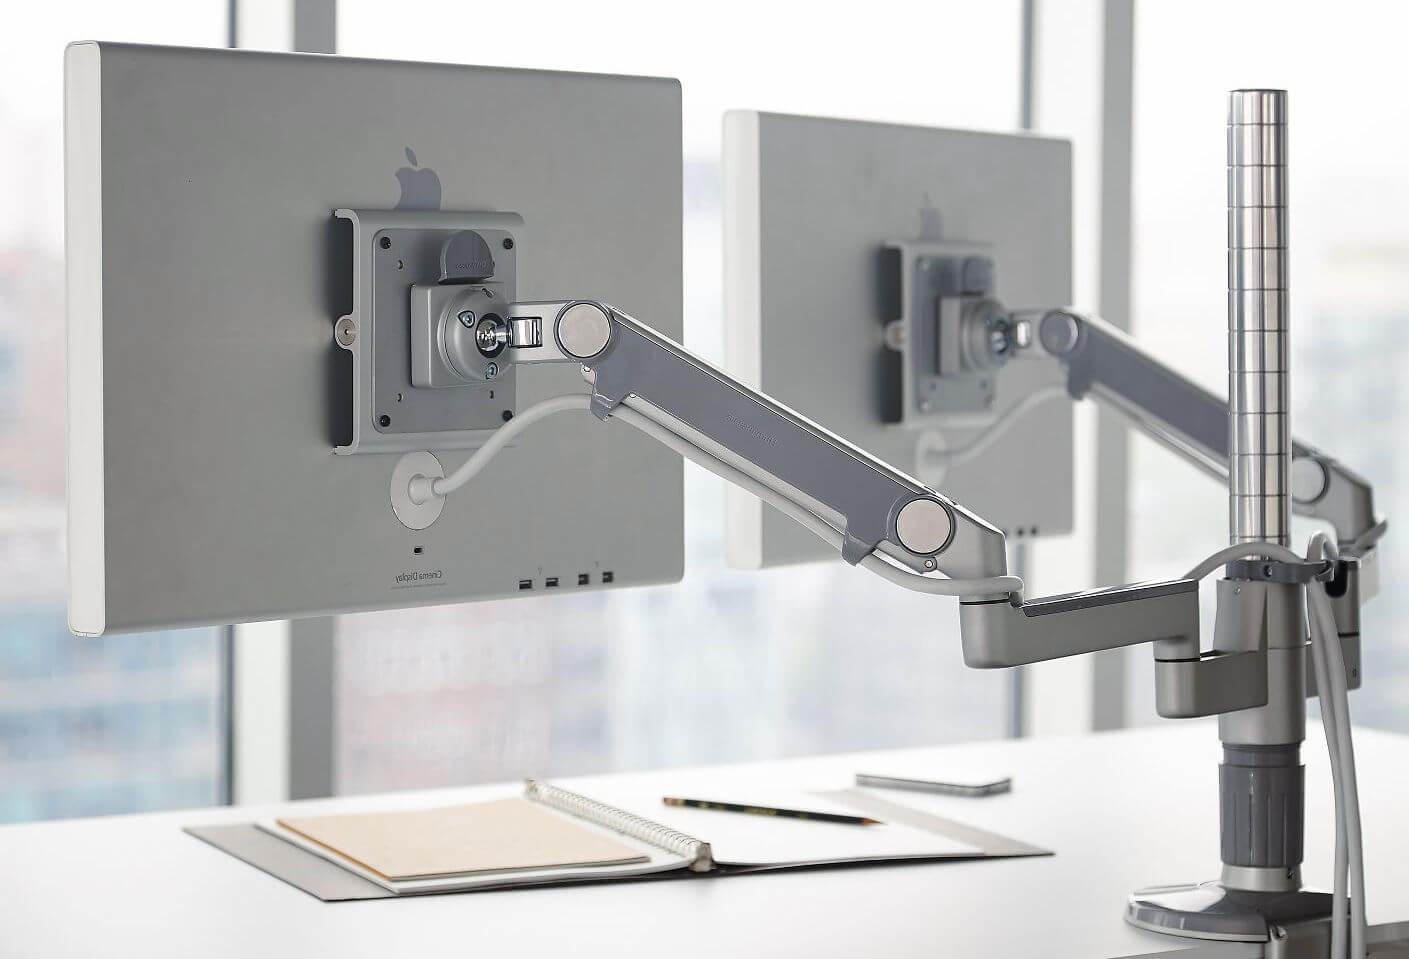 Humanscale M/Flex Multi-Monitor Arm System